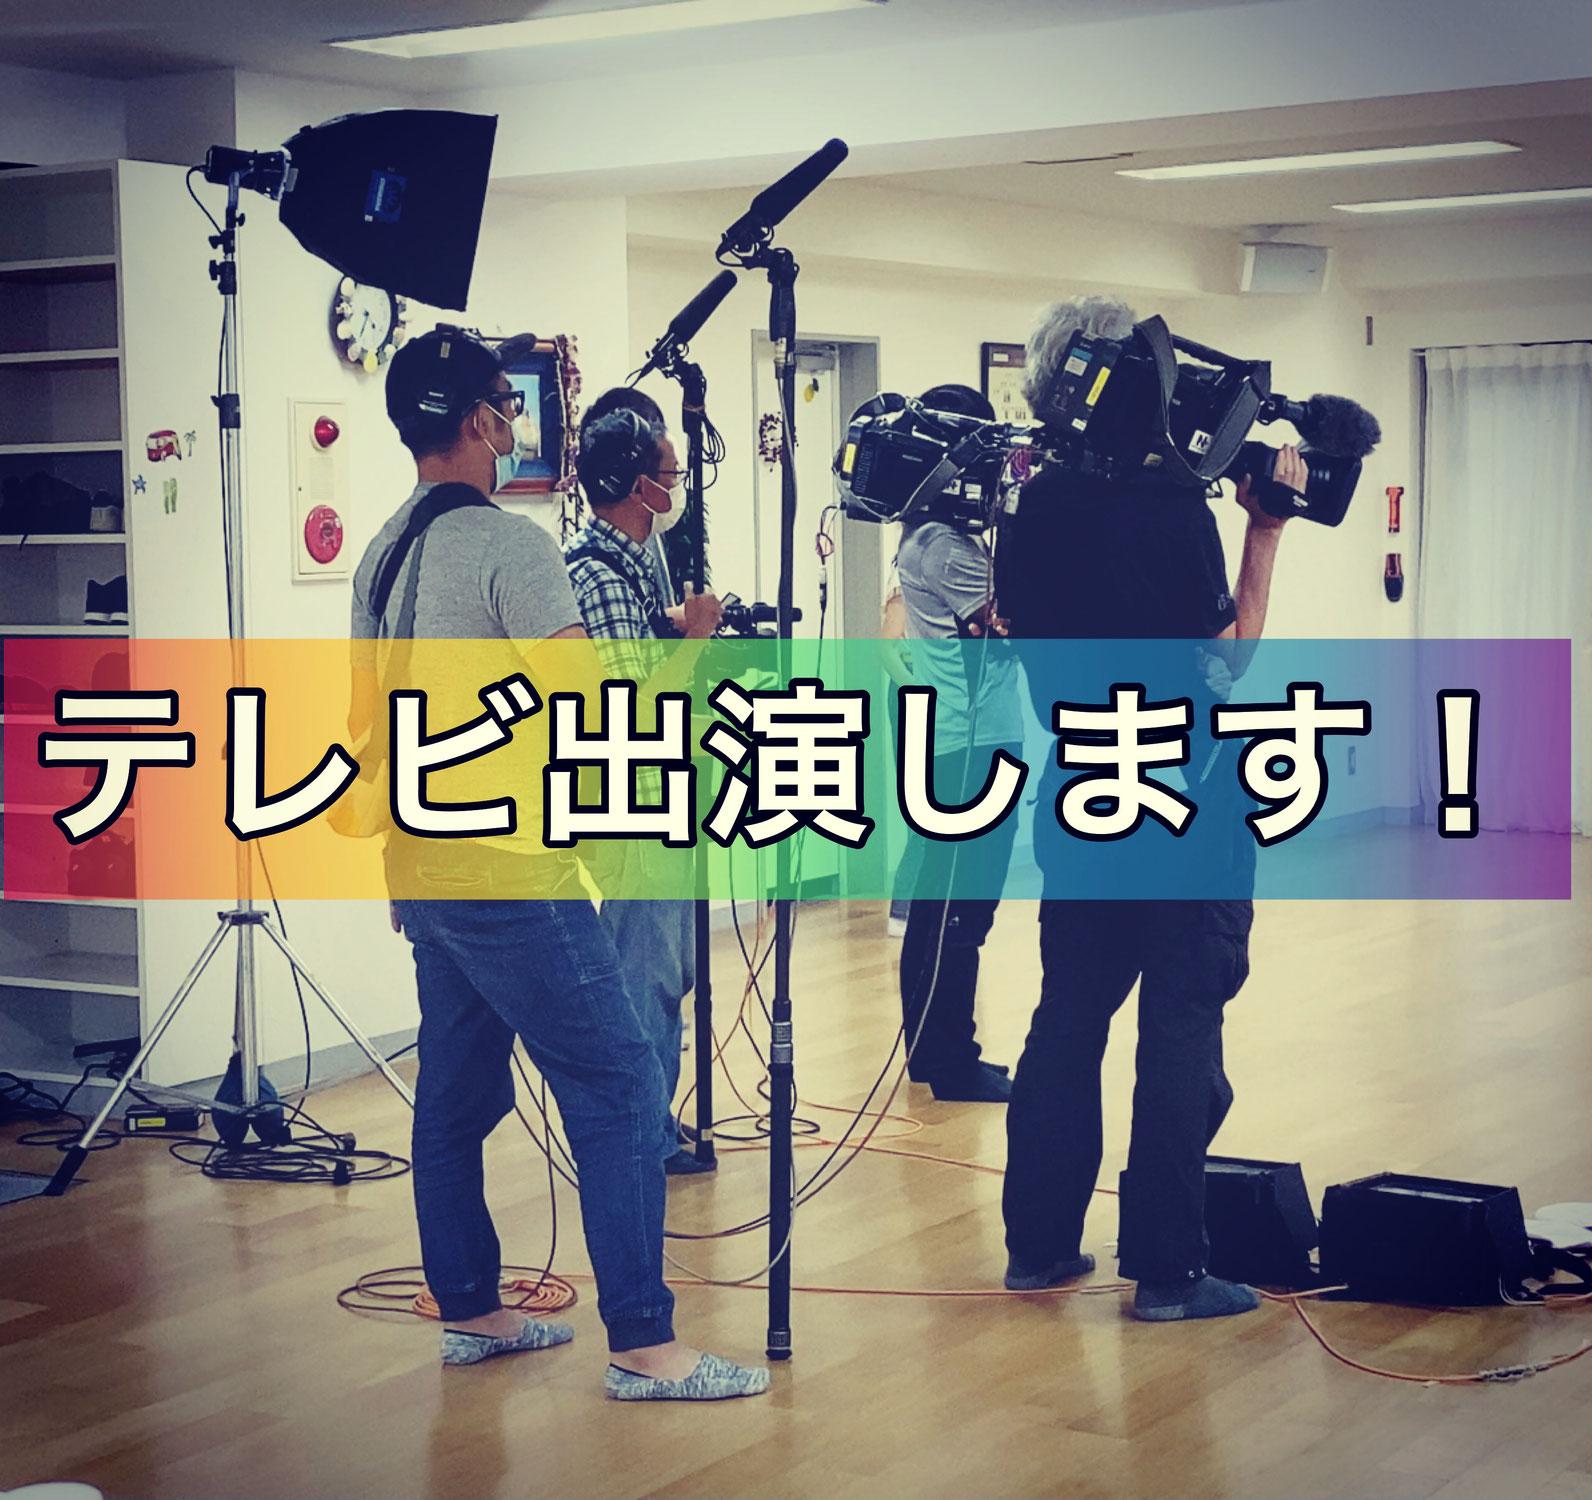 NHK教育番組テレビ アネラ先生出演詳細のお知らせ